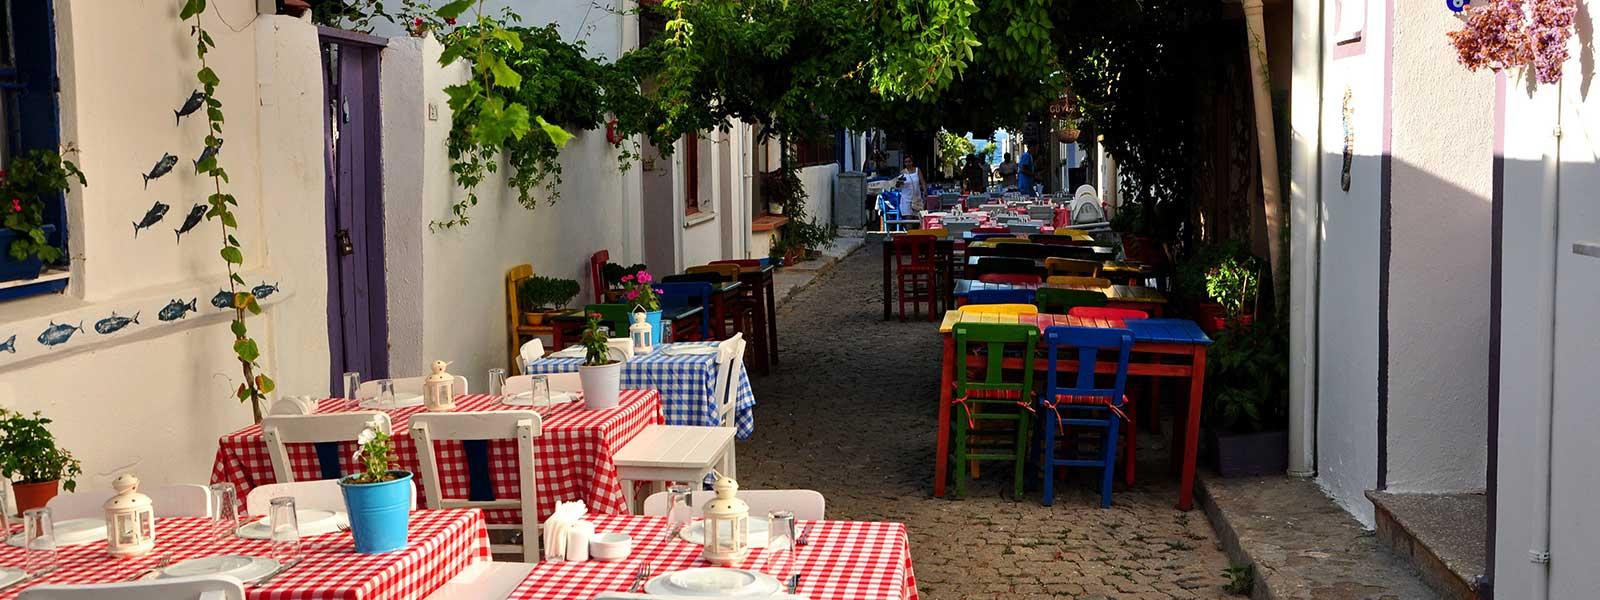 Bozcaada (Tenedos) Turkey